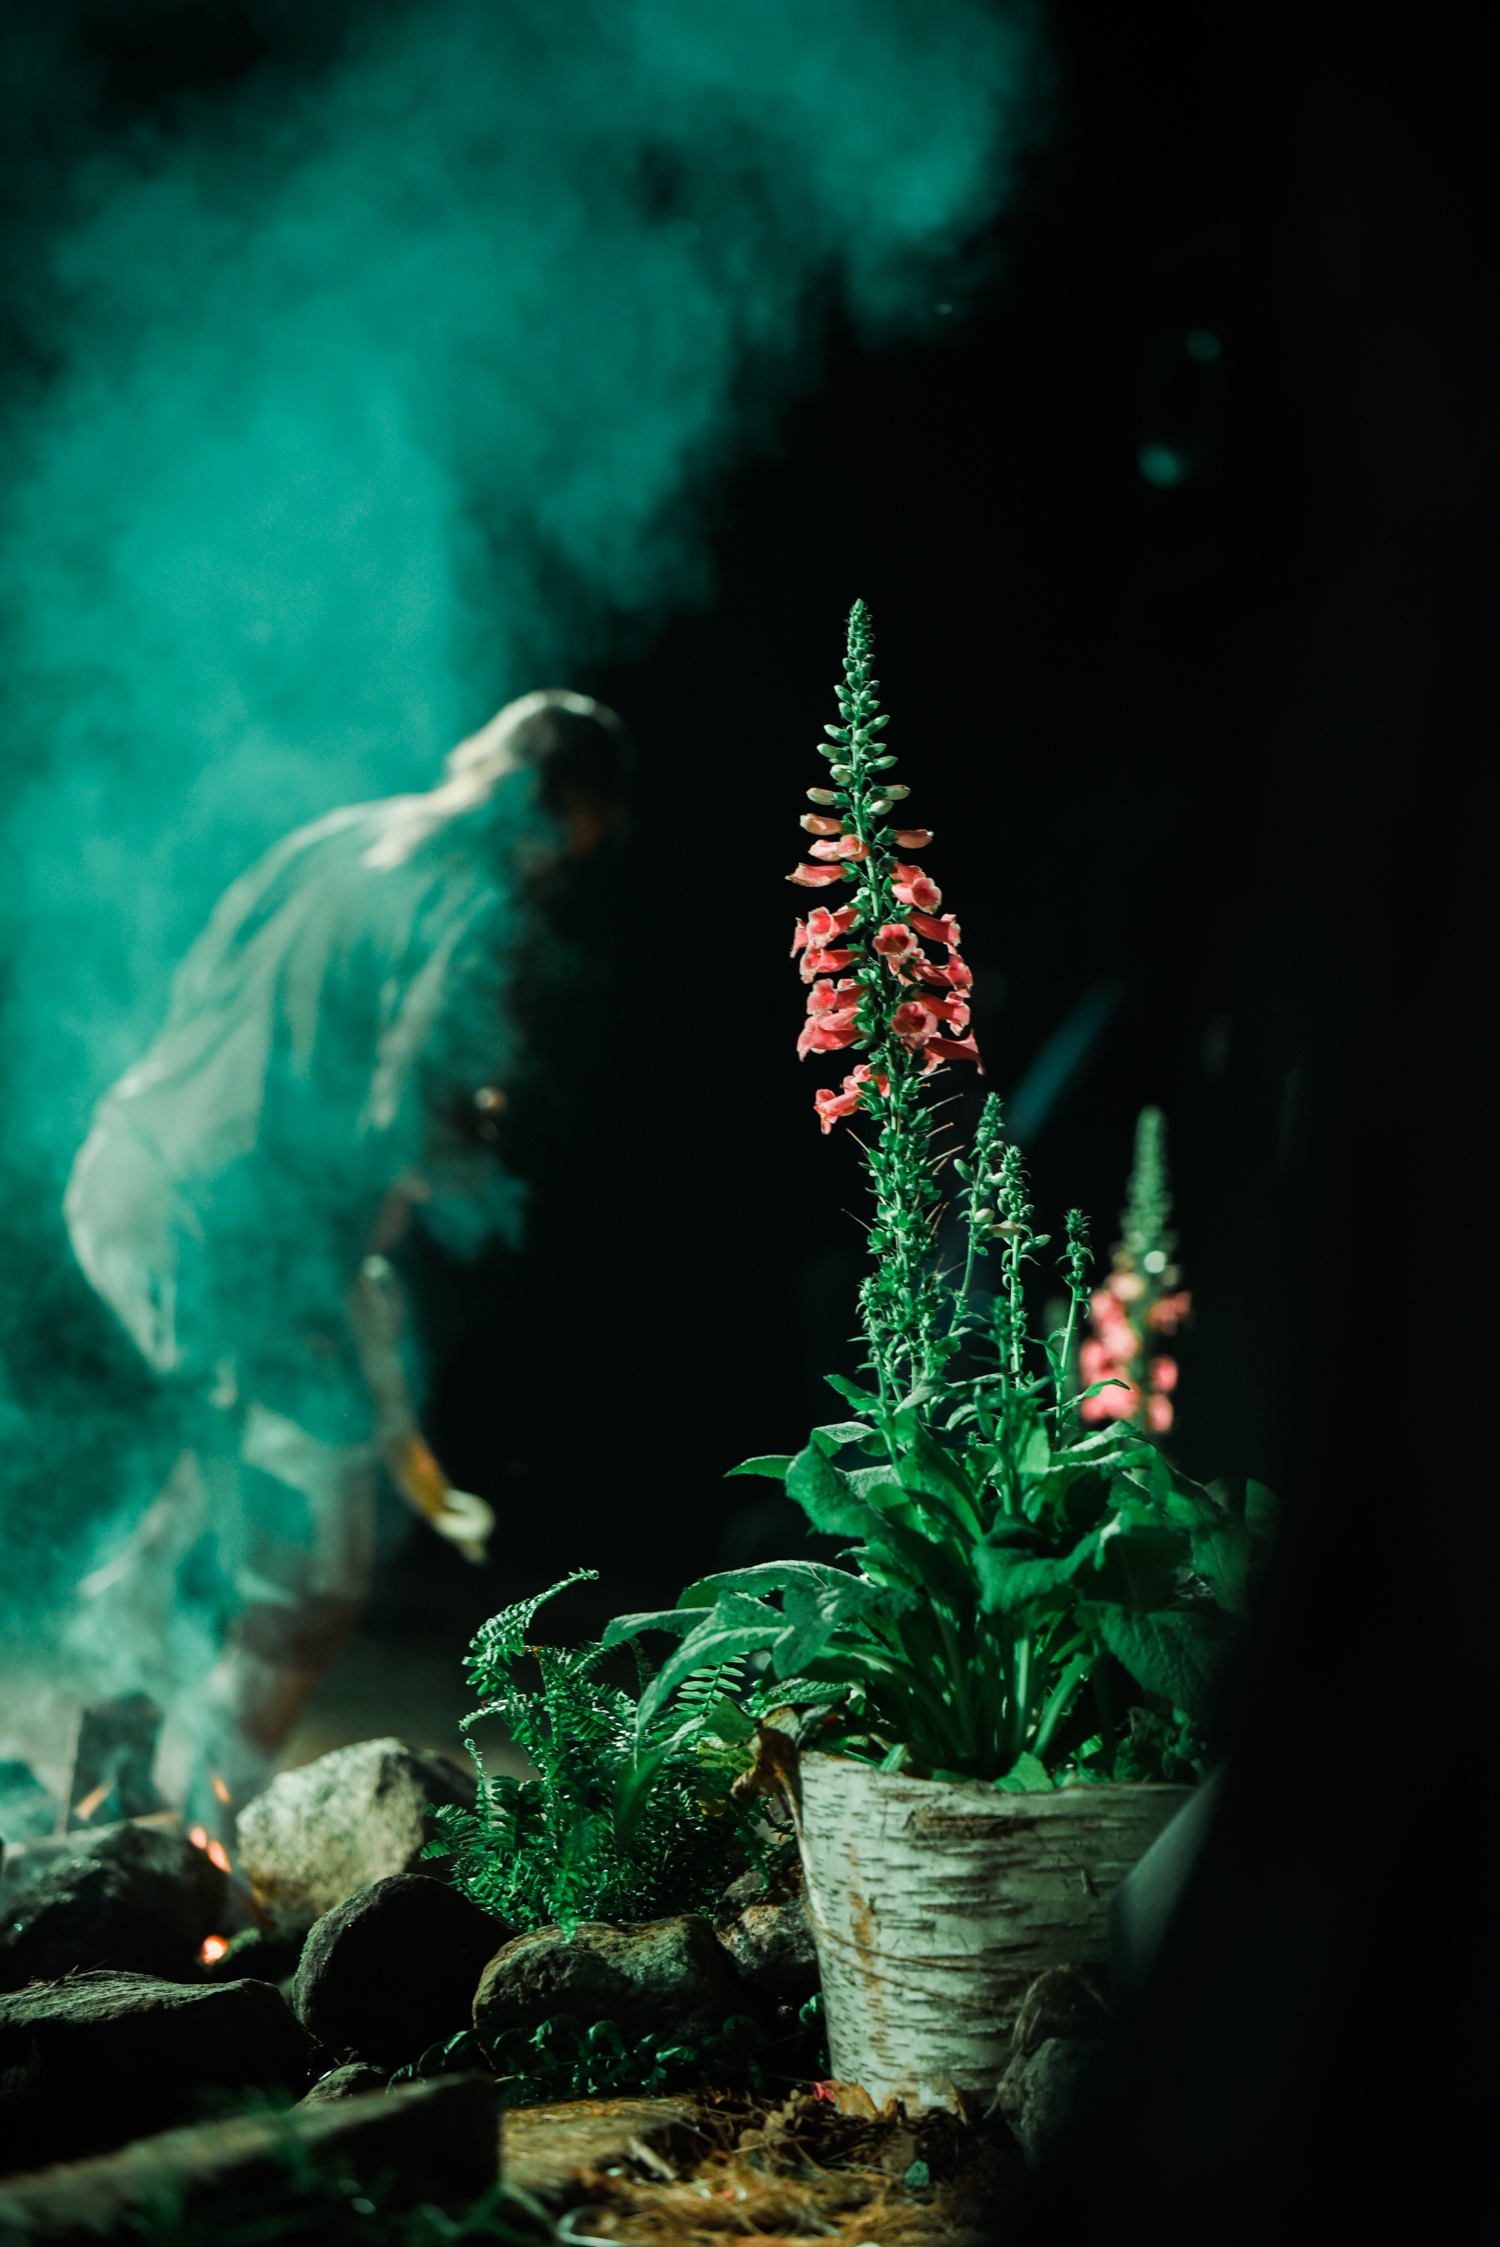 ephemera designs unifier festival photography berkshires of green haze with pink flower plant